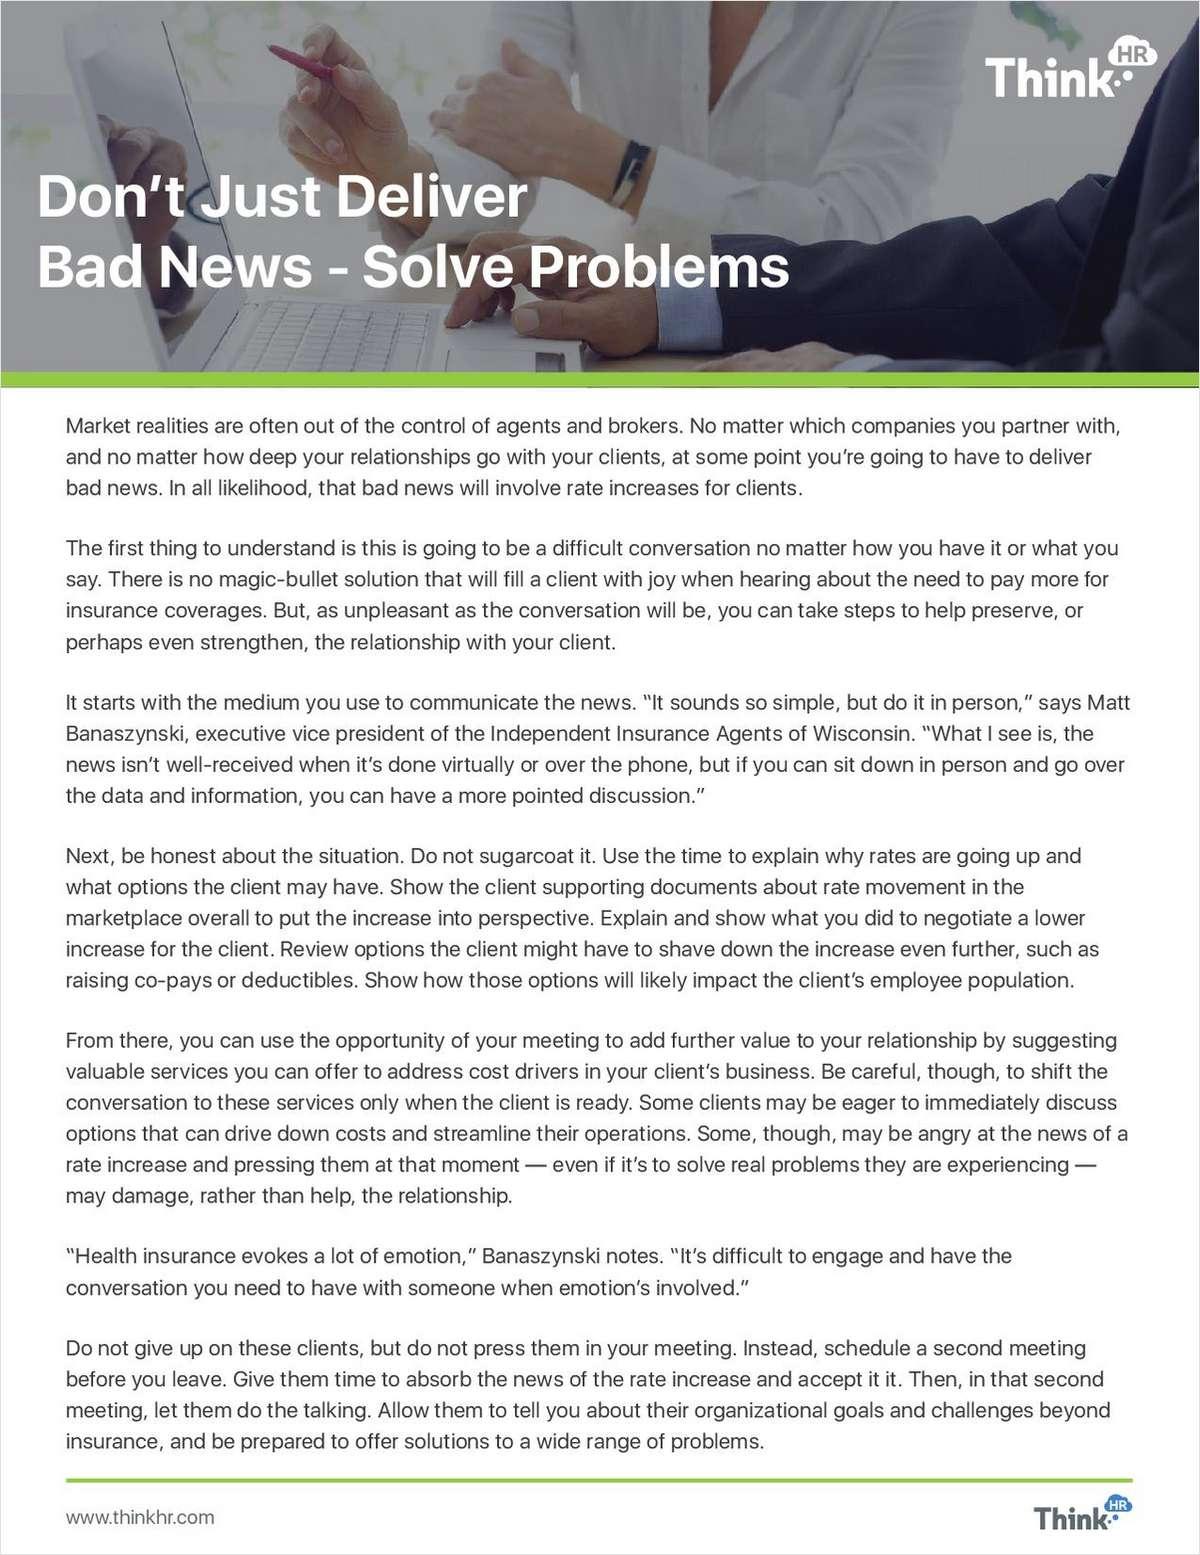 Don't Just Deliver Bad News -- Solve Insurance Problems